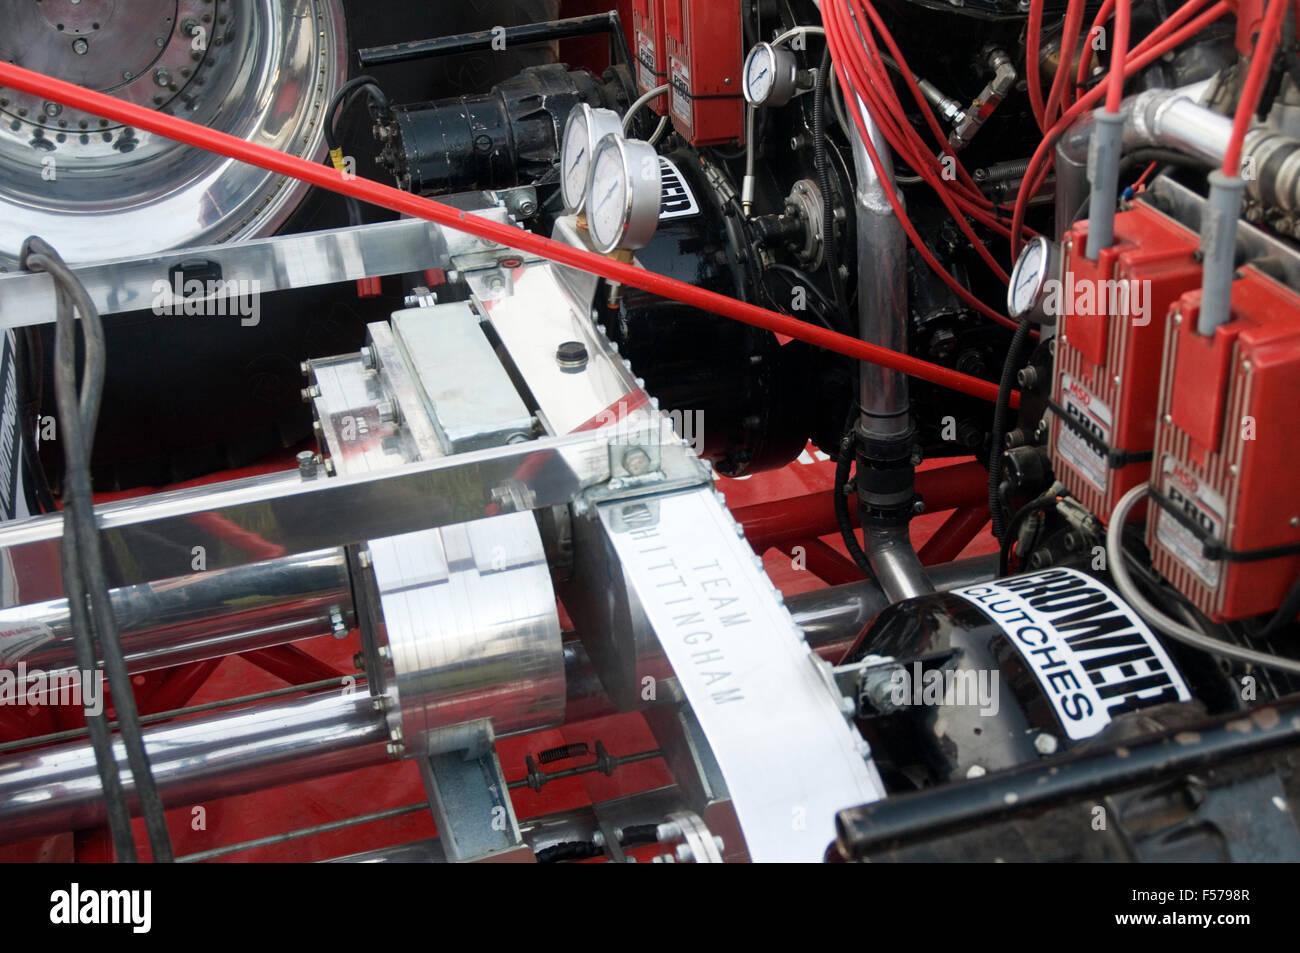 Fantastisch Drahtzaun Bahre Traktor Fotos - Schaltplan Serie Circuit ...